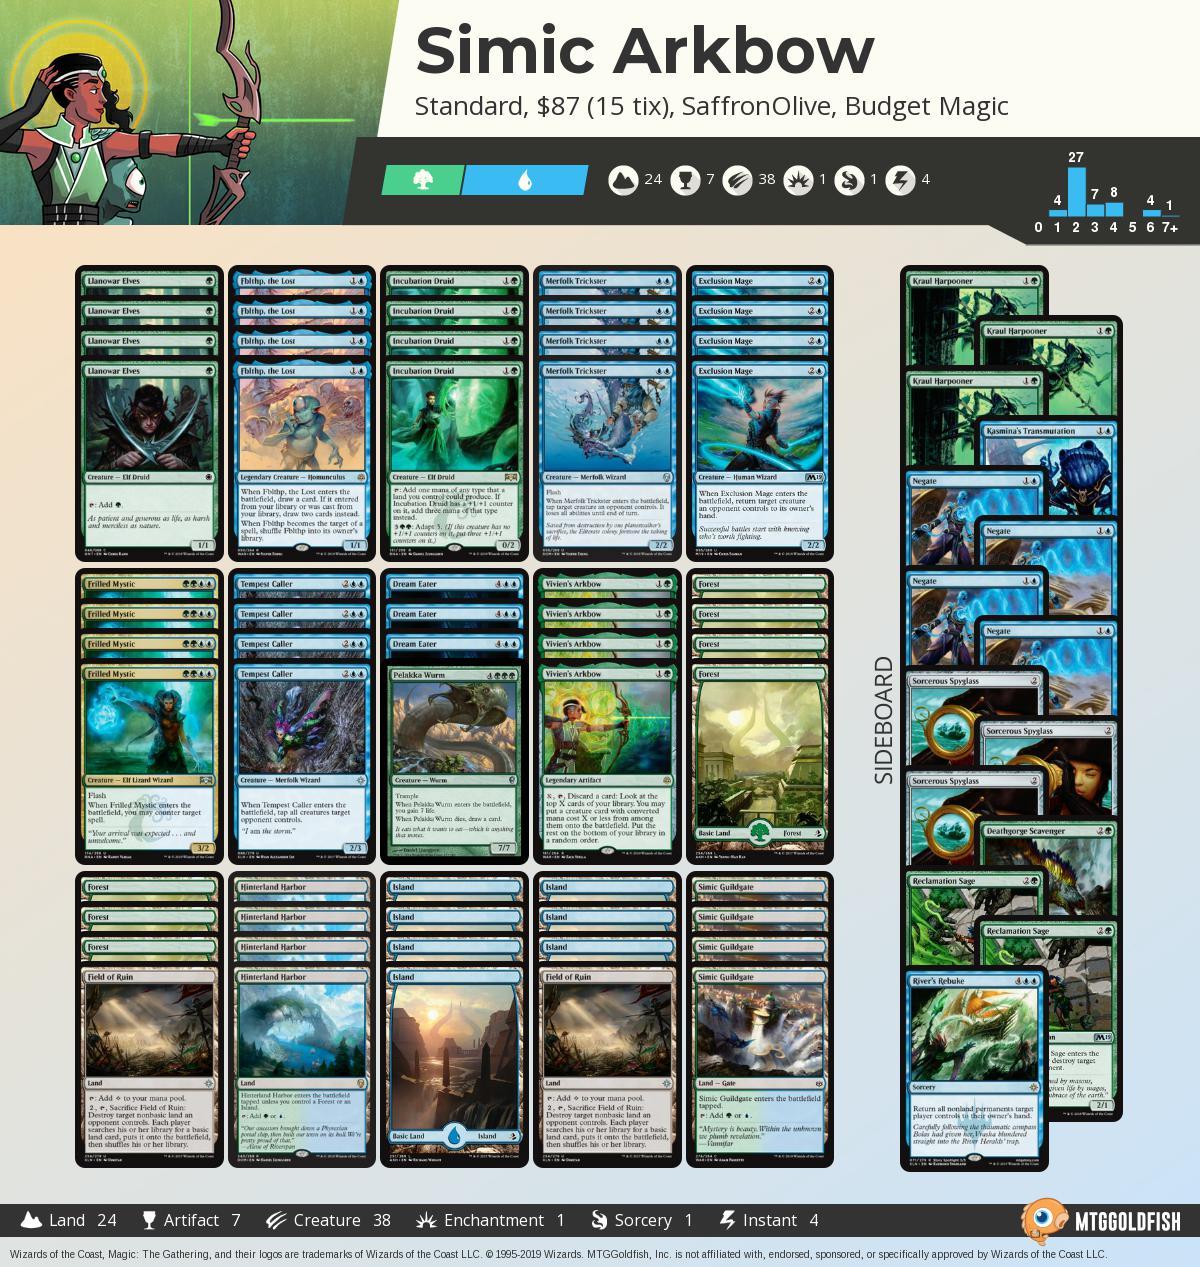 Simic%2barkbow 93e079c1 6dec 40d2 96ef 329e3a9a0f57%2ejpg